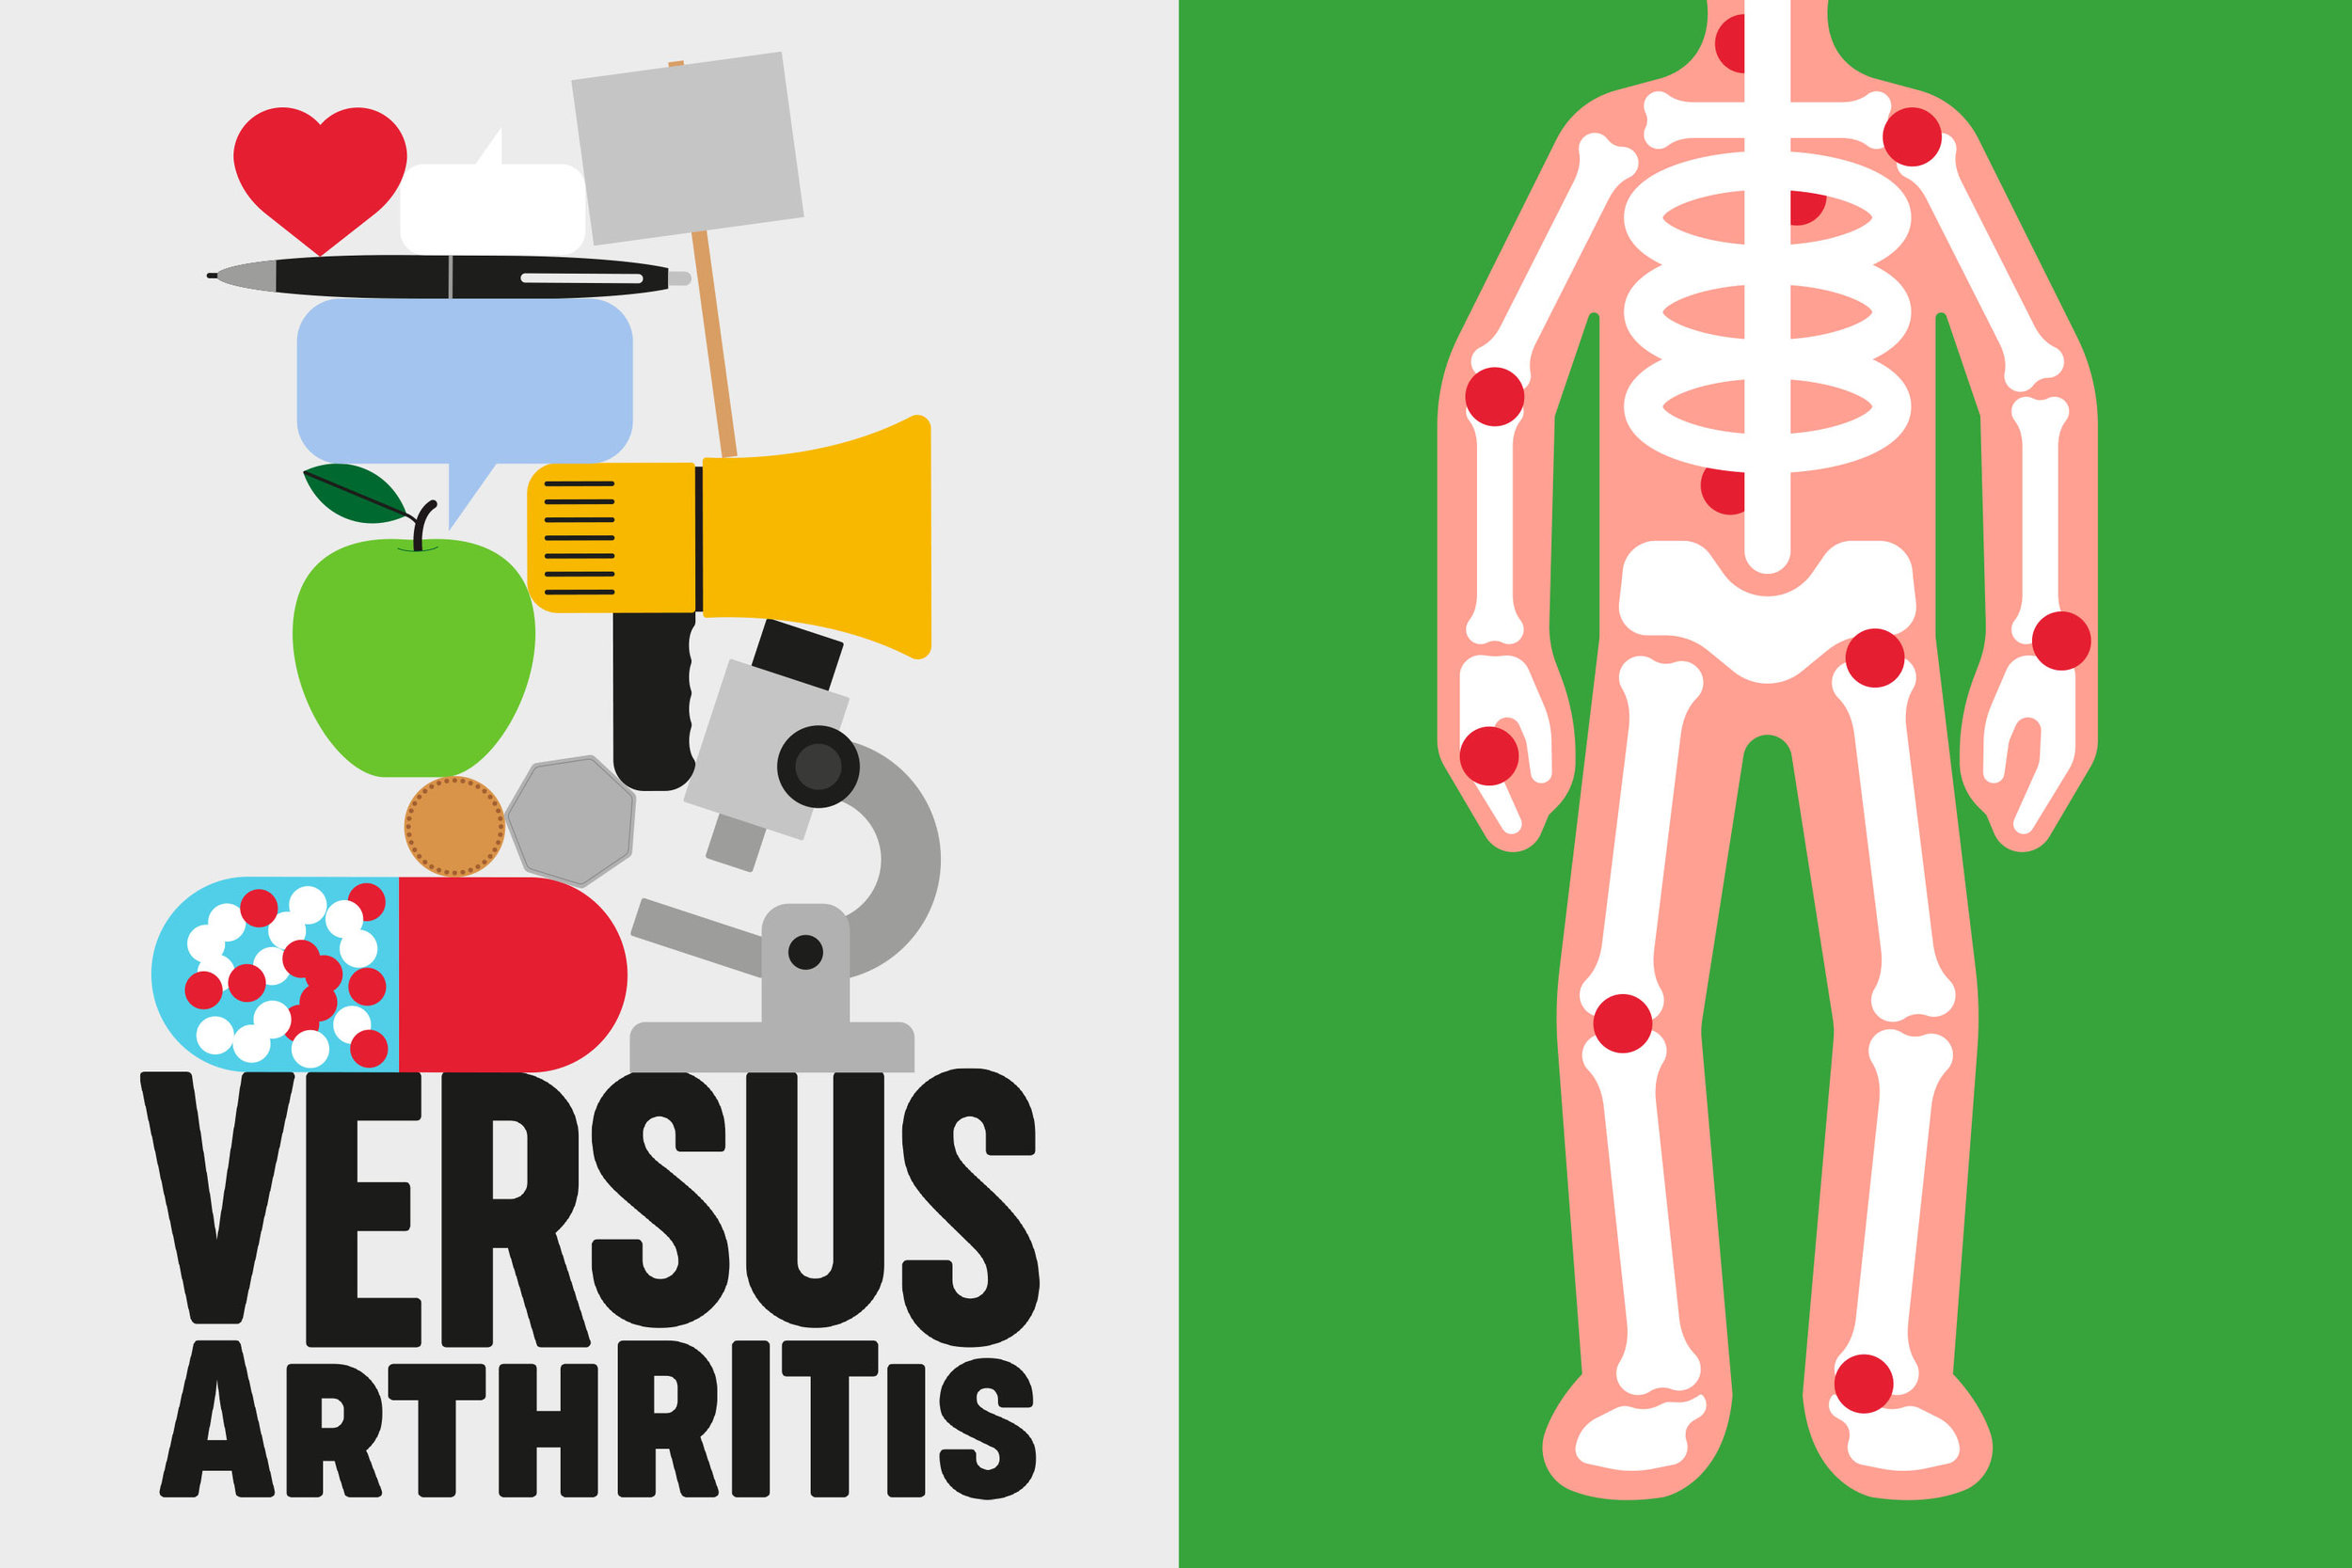 Re_Versus-arthritis_IllustrationsArtboard 1.jpg